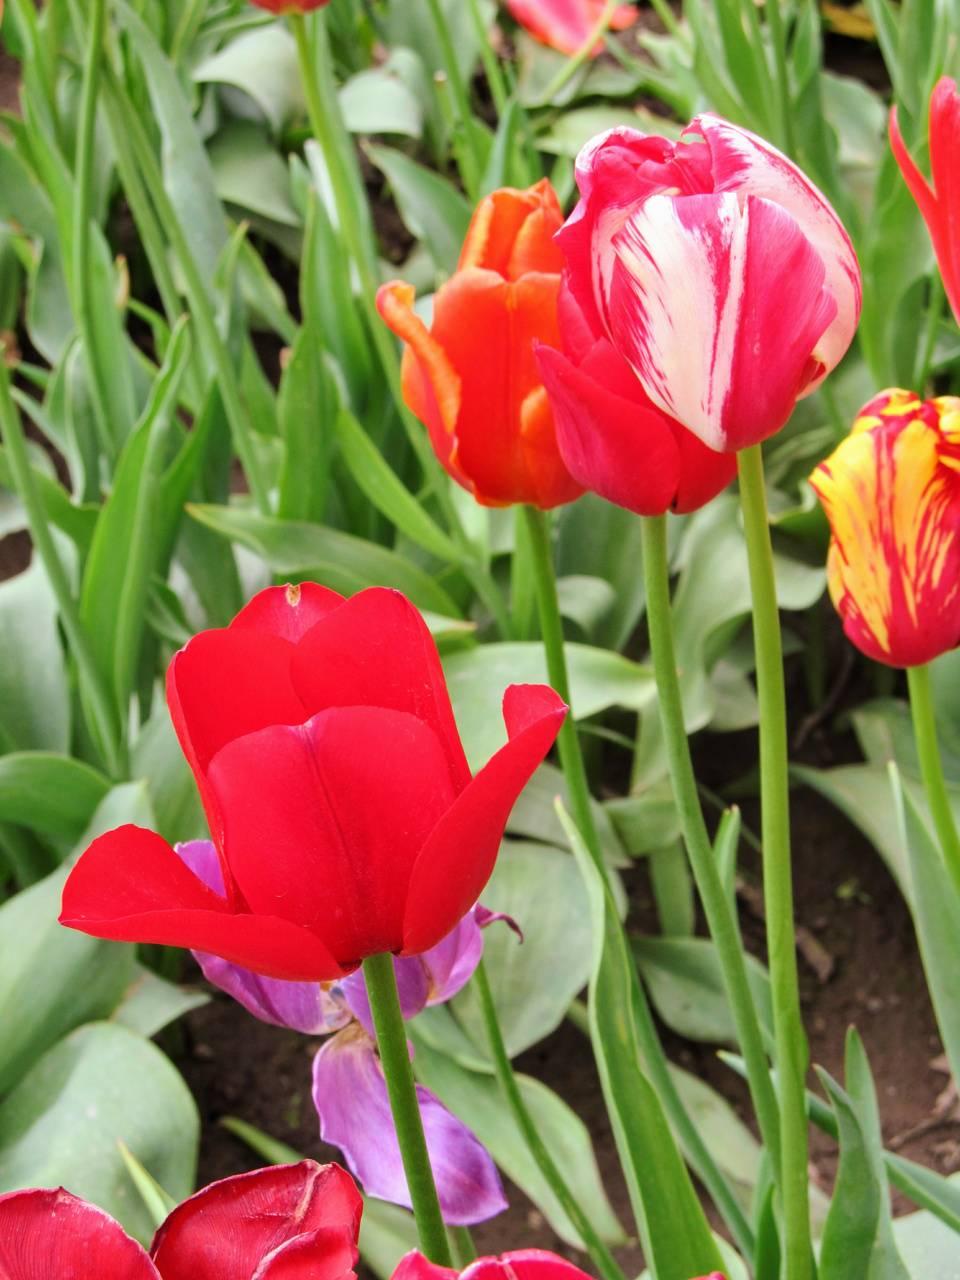 Varied Tulips 2